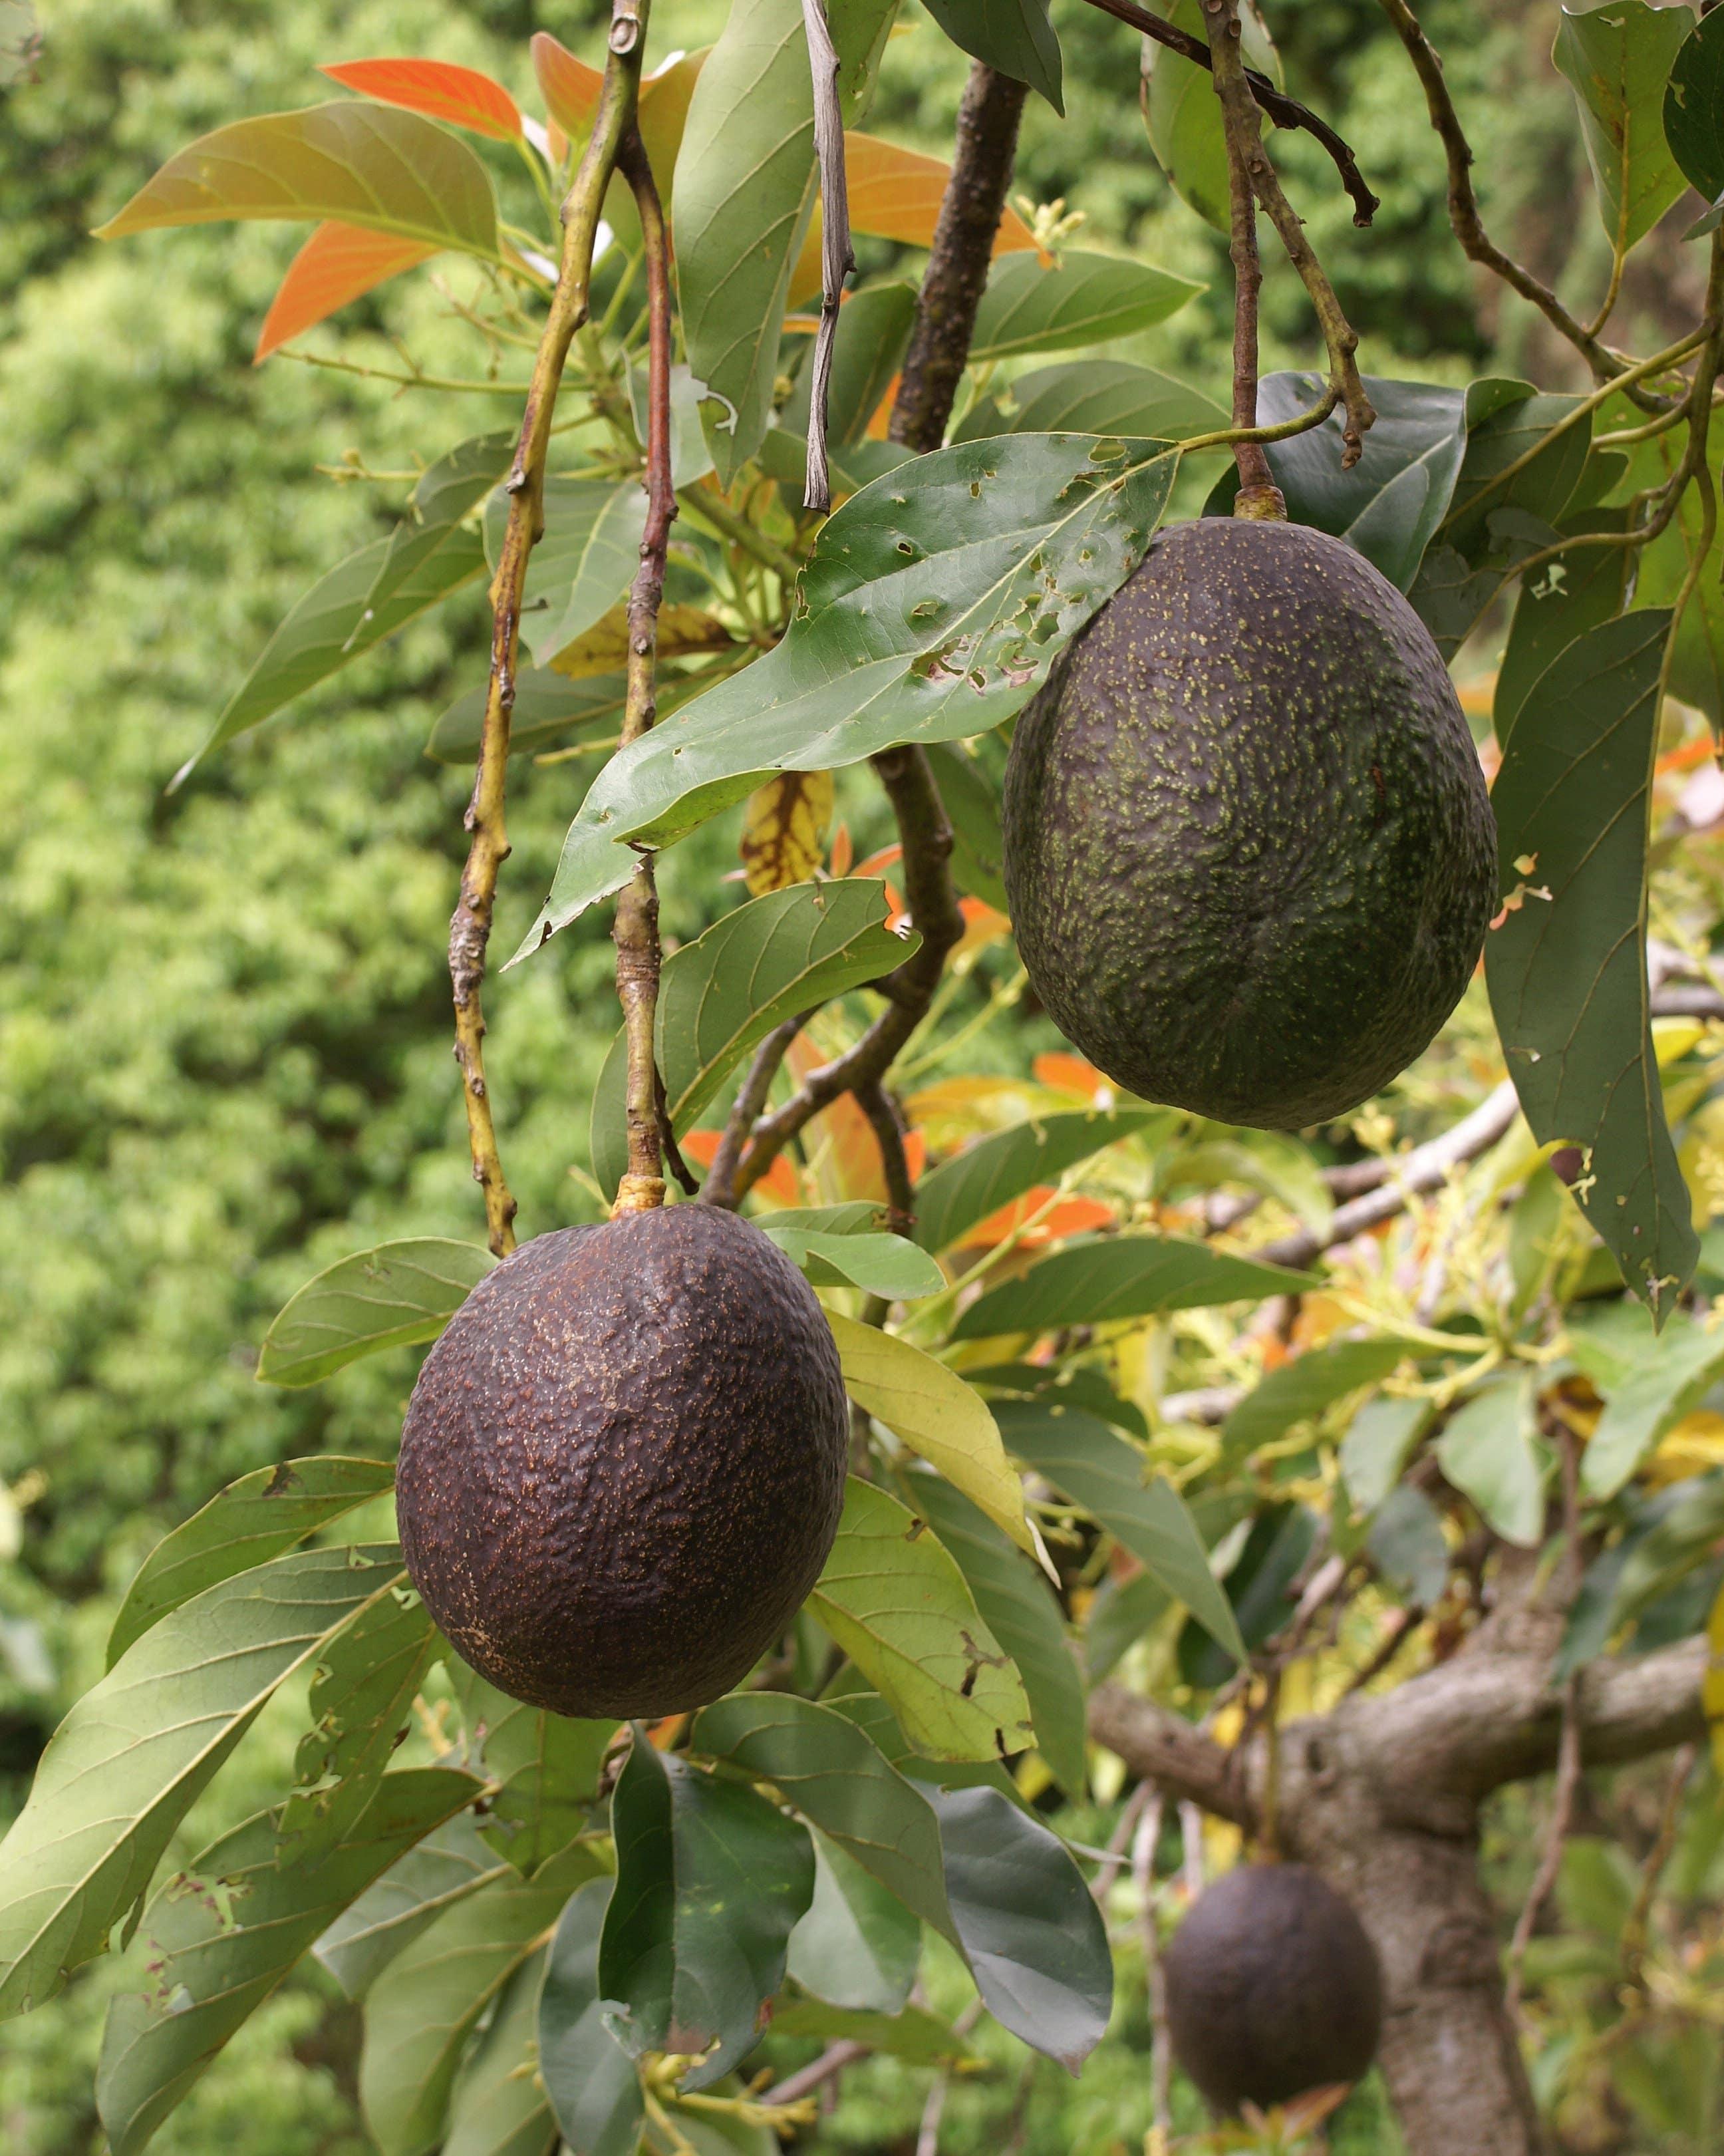 Avocat, avocado